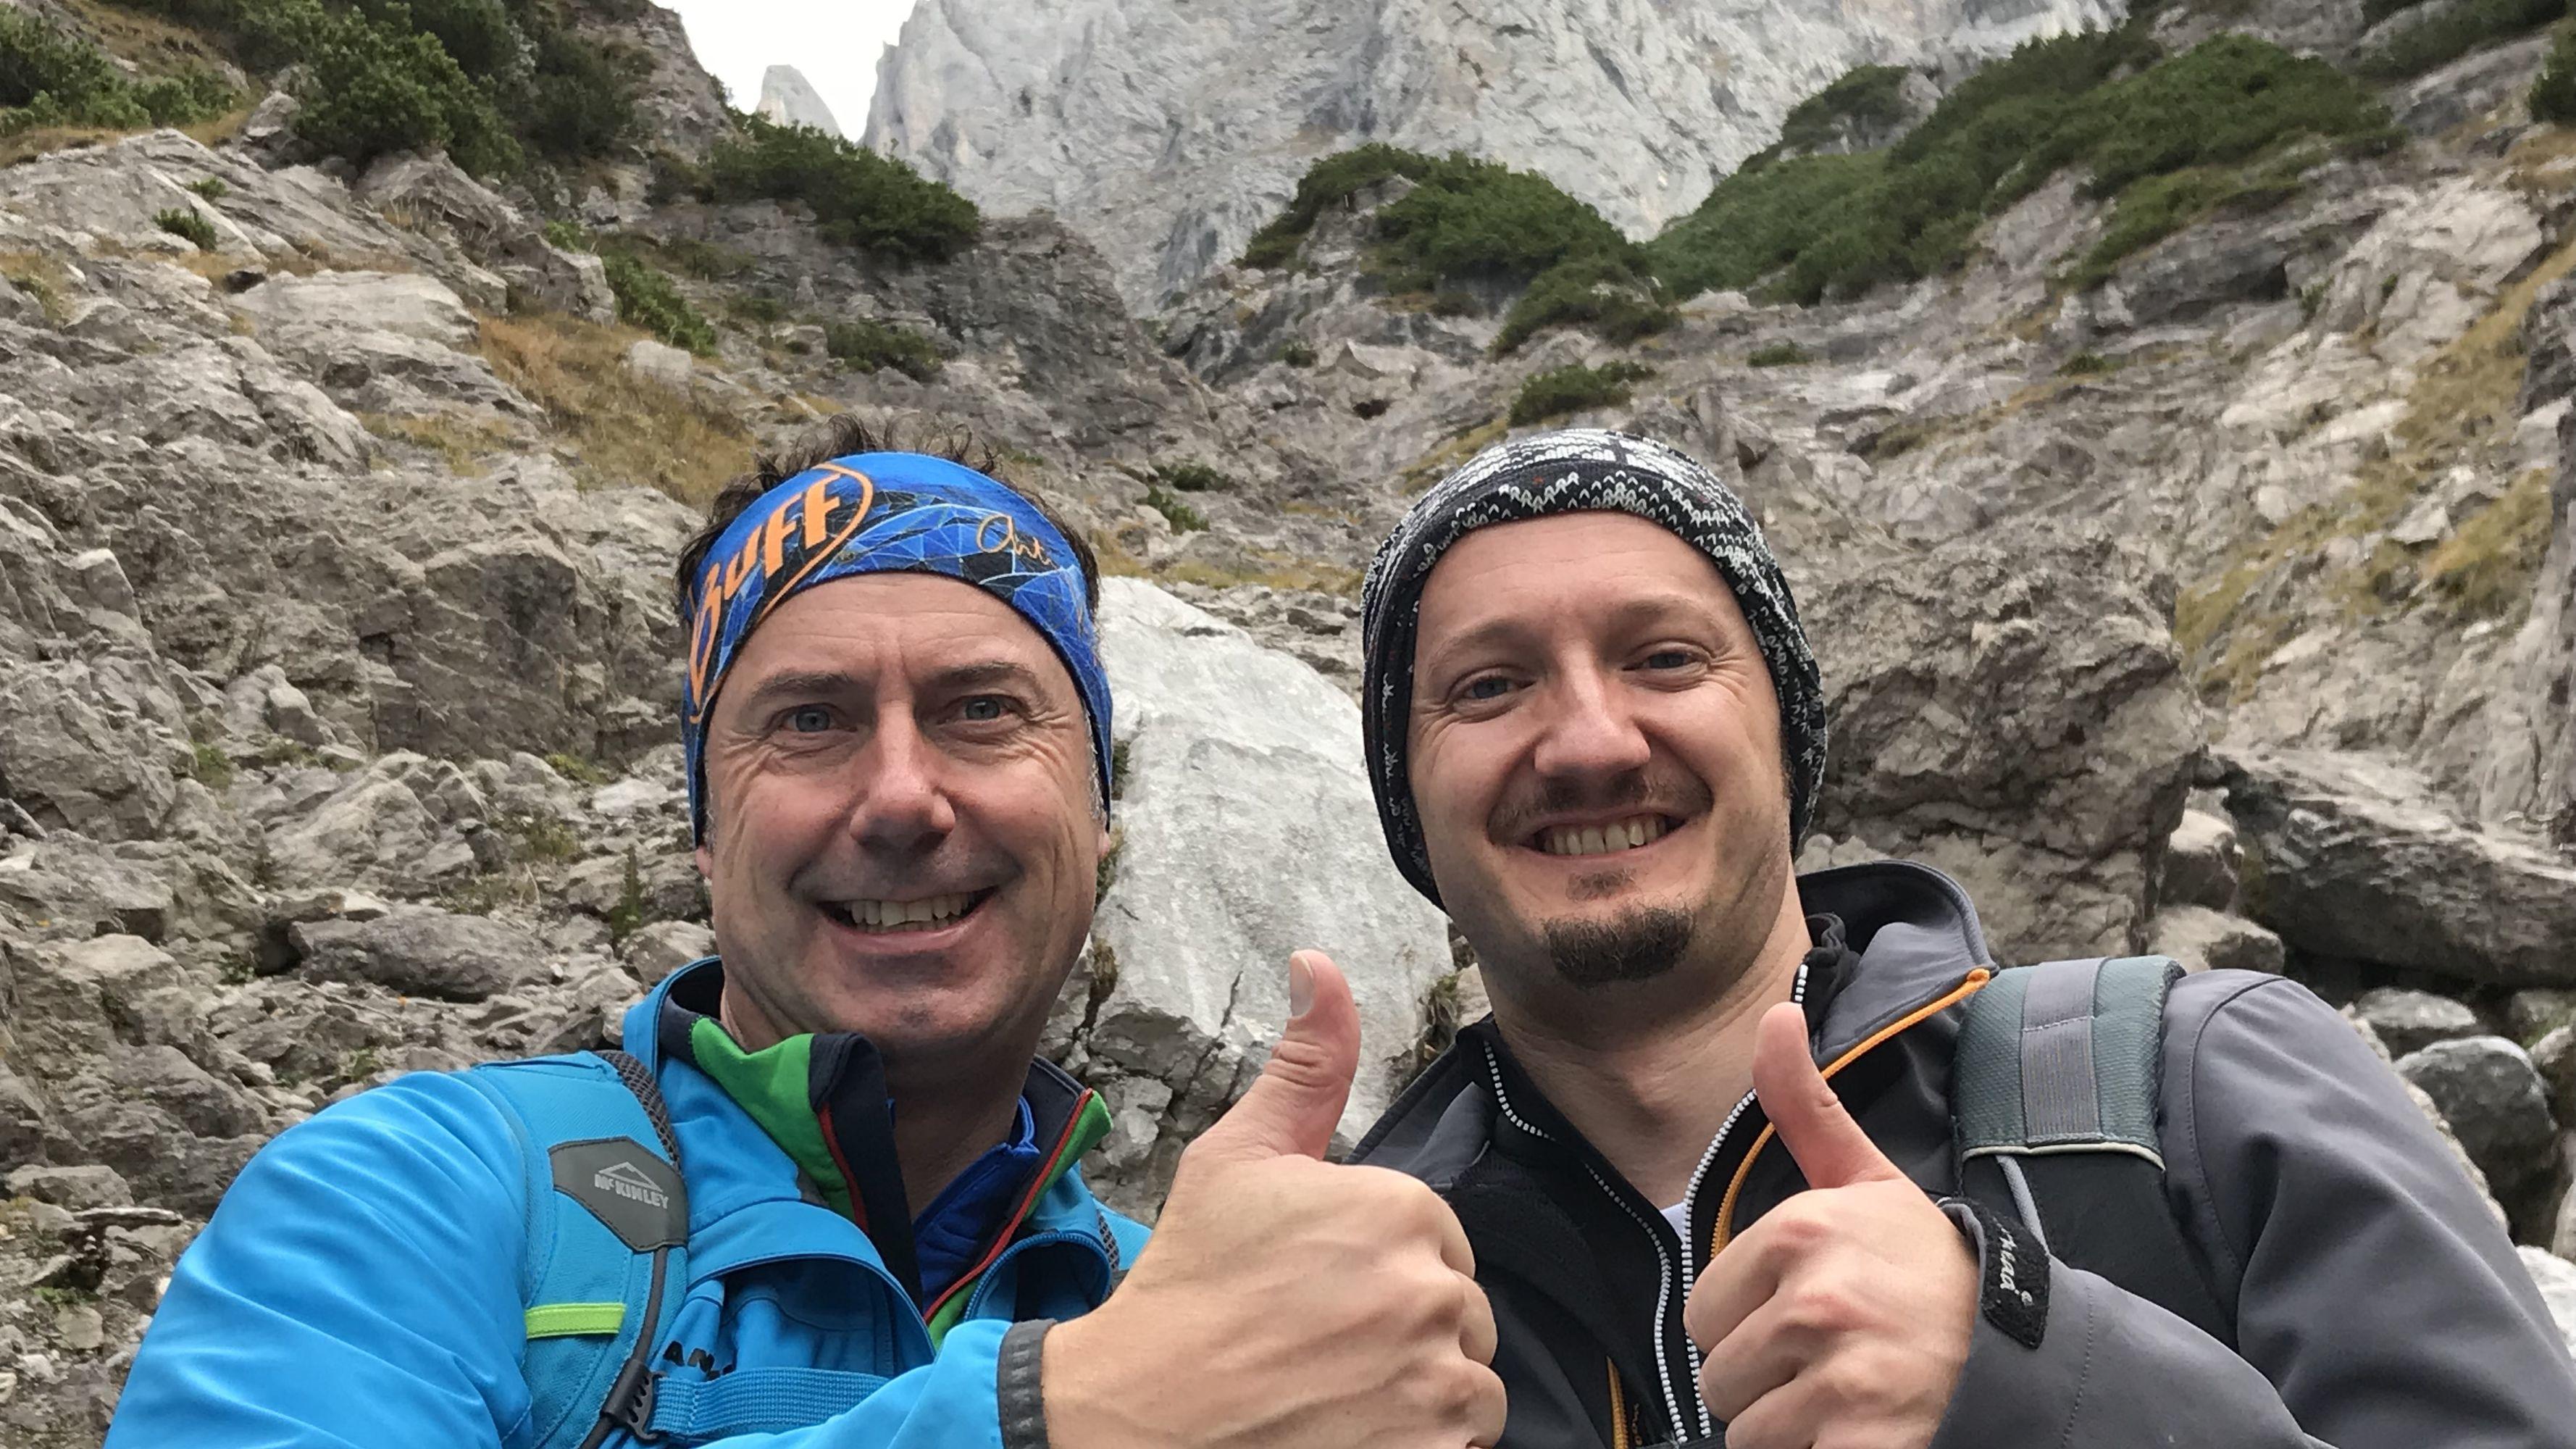 Mag. (FH) Helmut Schweinester & Johann Mösinger